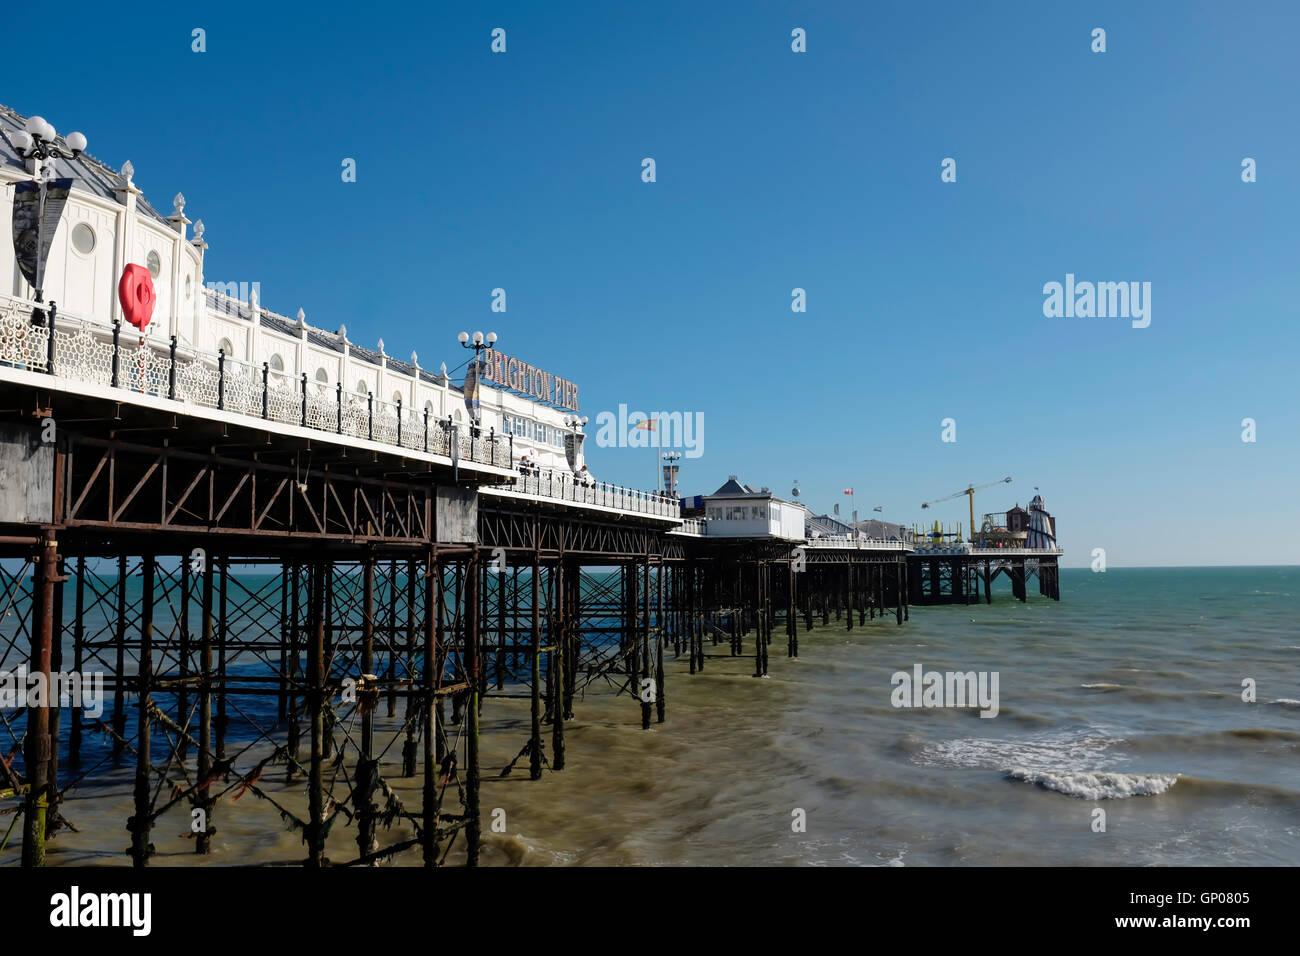 Brighton Pier, Bighton Beach, Sussex,United Kingdom - Stock Image